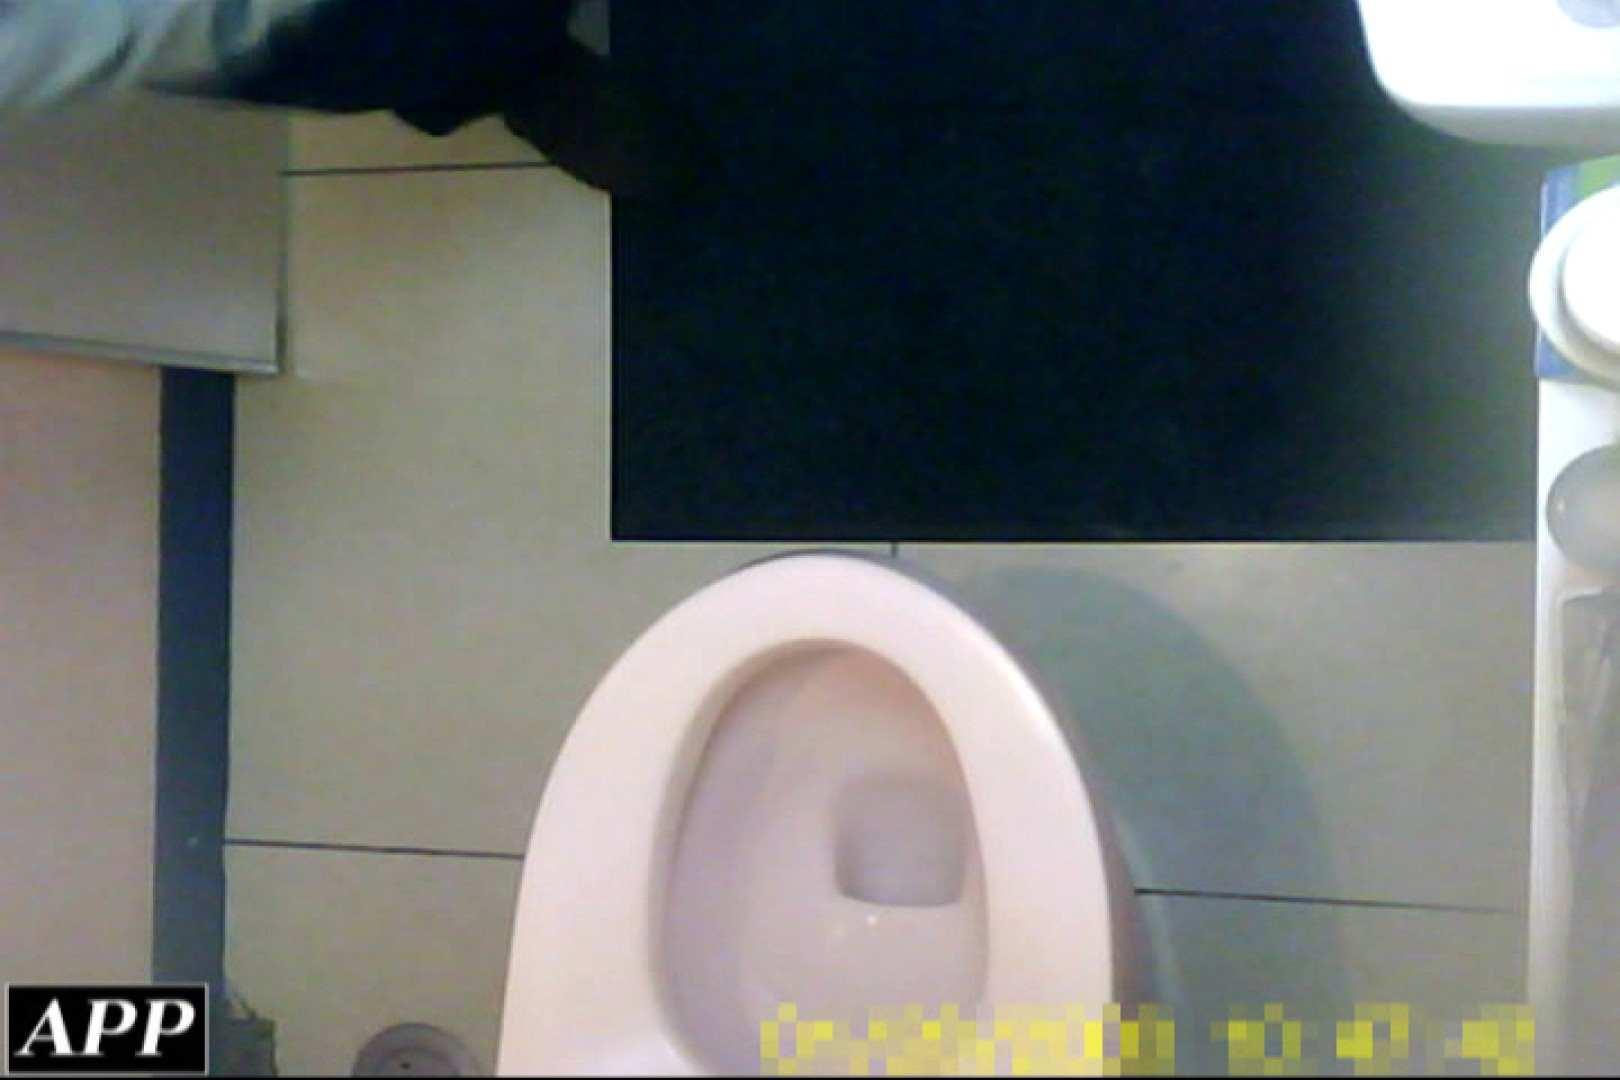 3視点洗面所 vol.106 OLエロ画像  112PICs 70